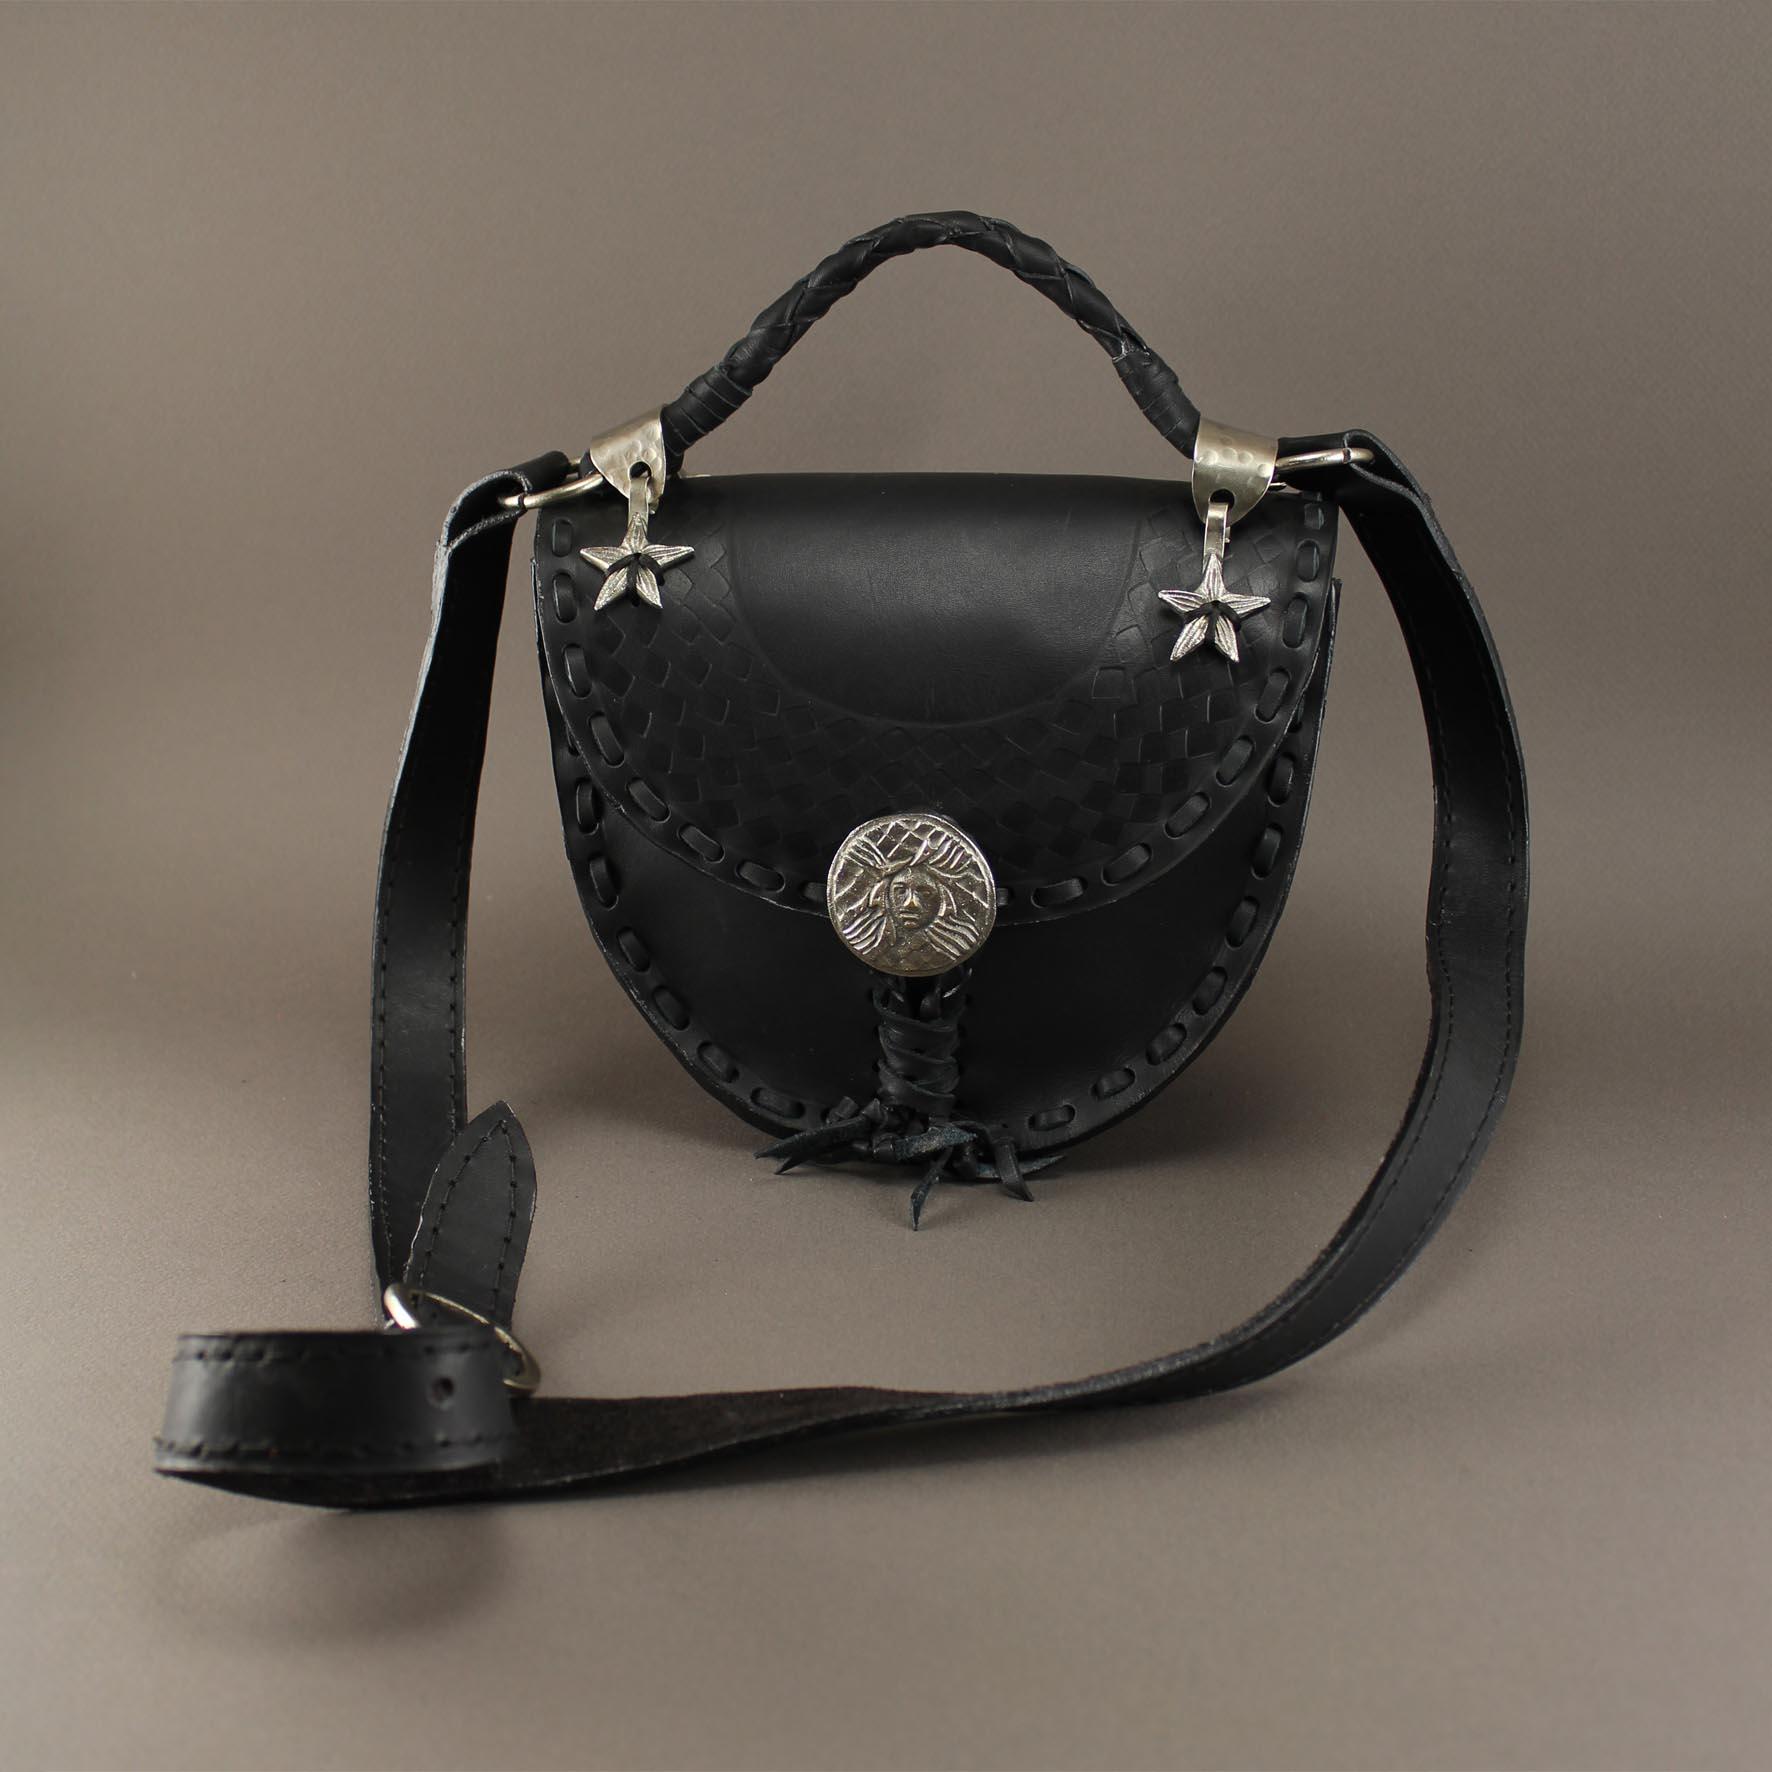 Small Diamond Shaped Mediosa Bag